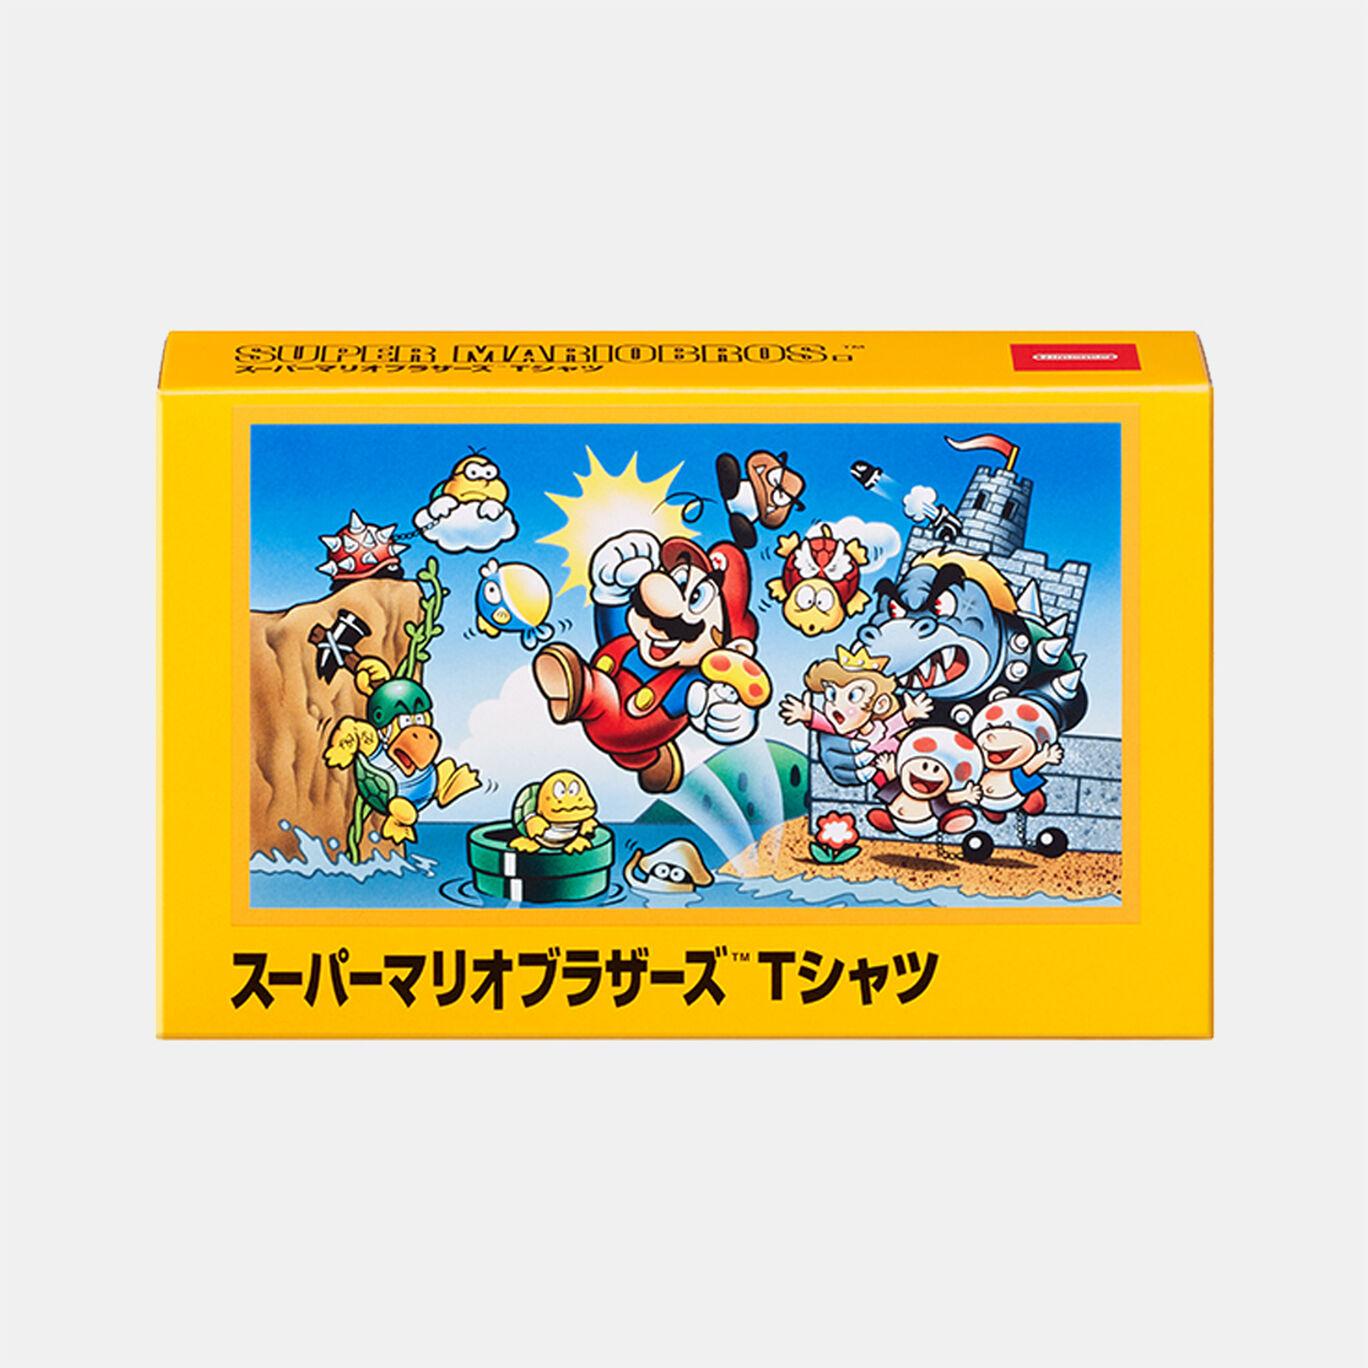 Tシャツ スーパーマリオブラザーズ XL【Nintendo TOKYO取り扱い商品】